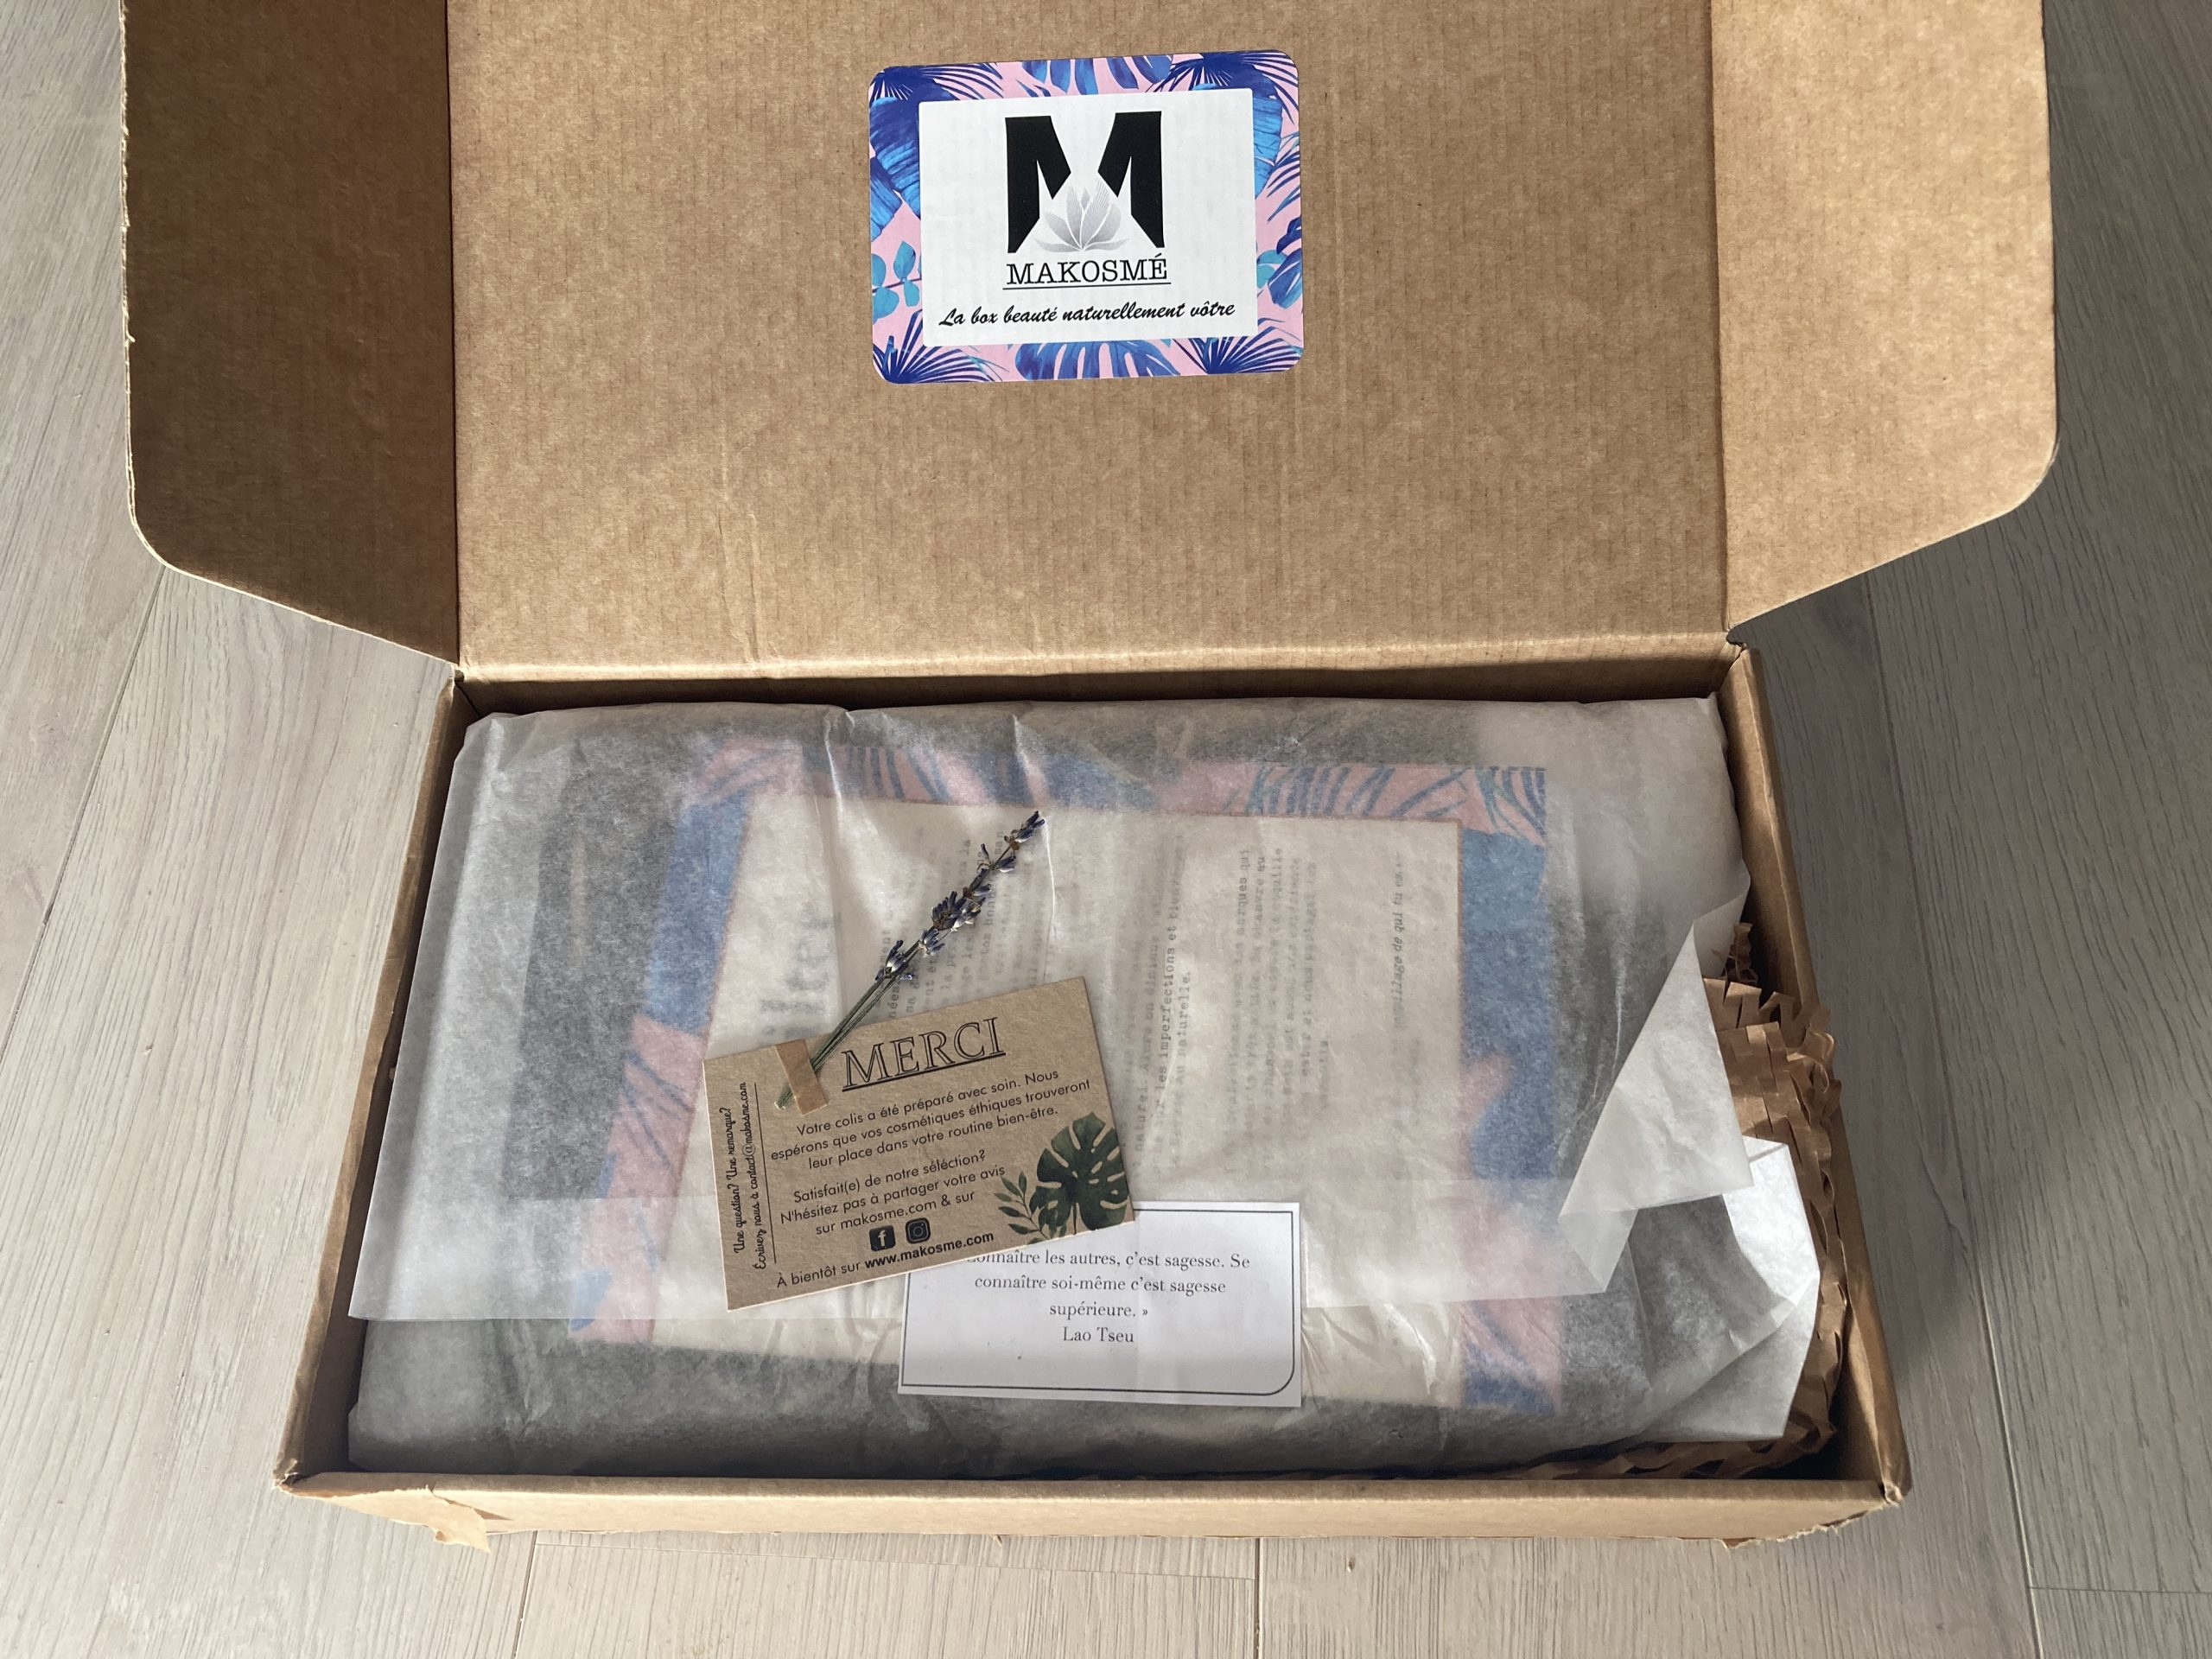 Makosmé box nofilter